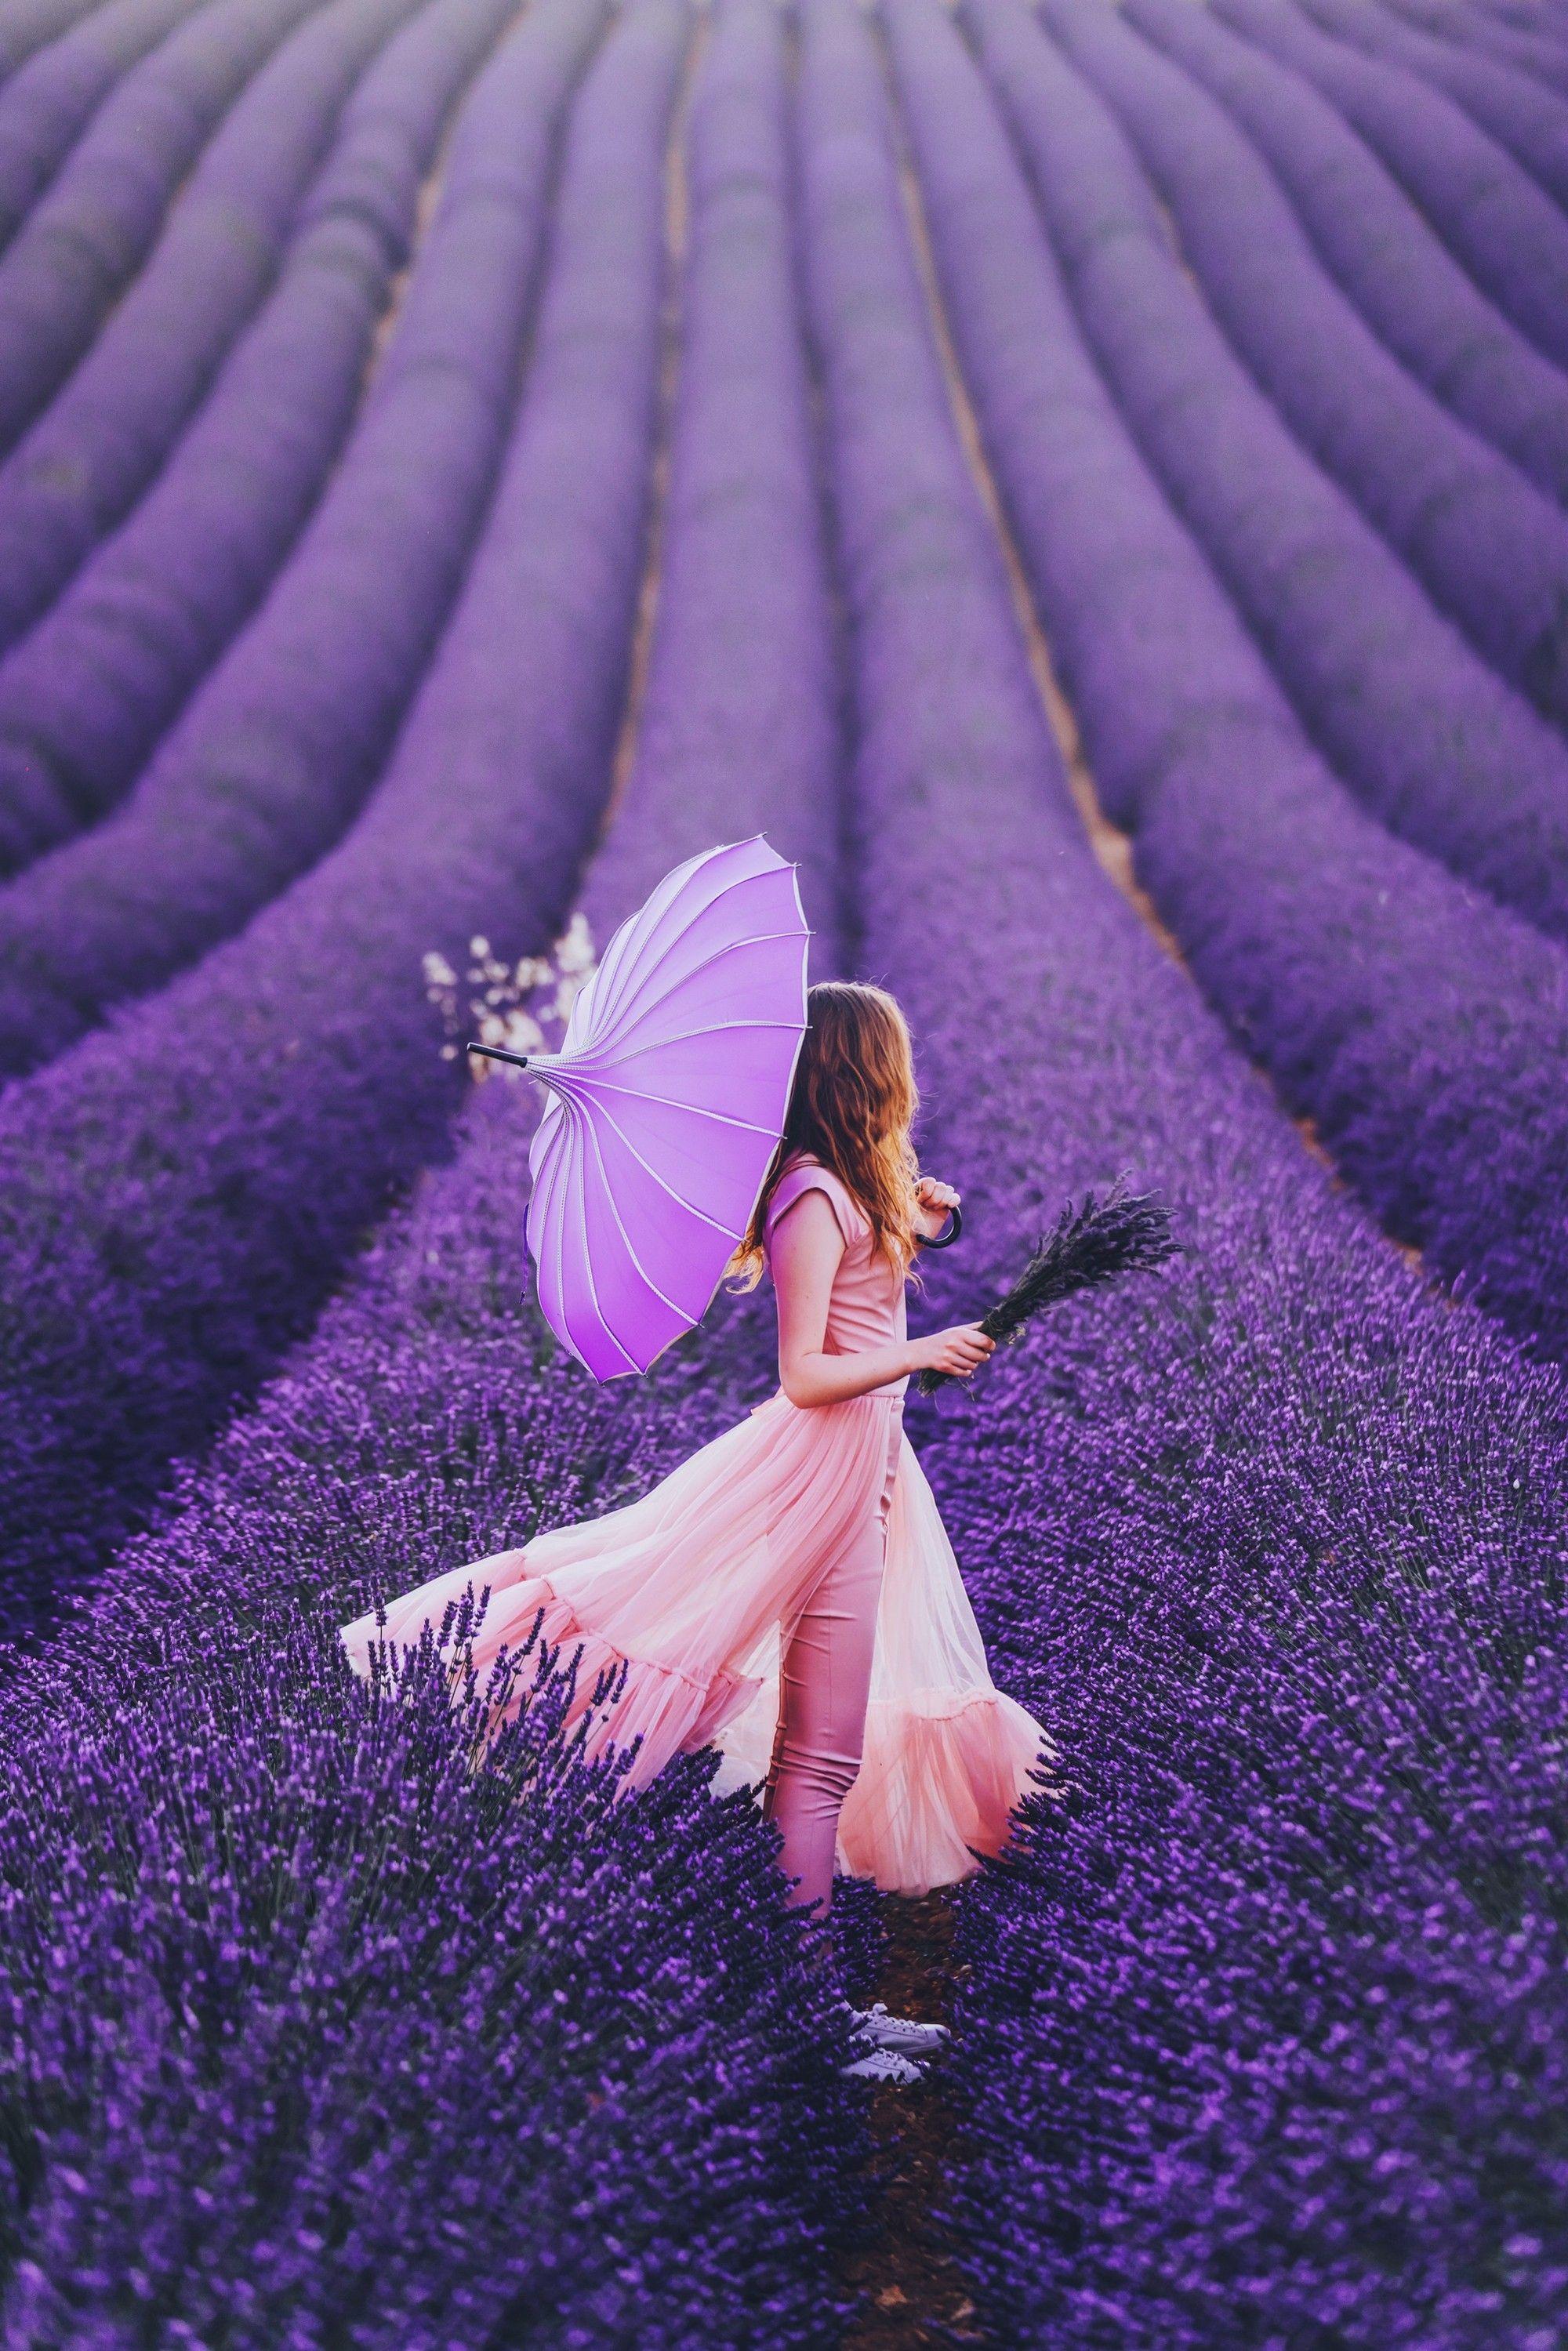 Lavanda Photo Lavender Fields Photography Lavender Fields Lovely Lavender